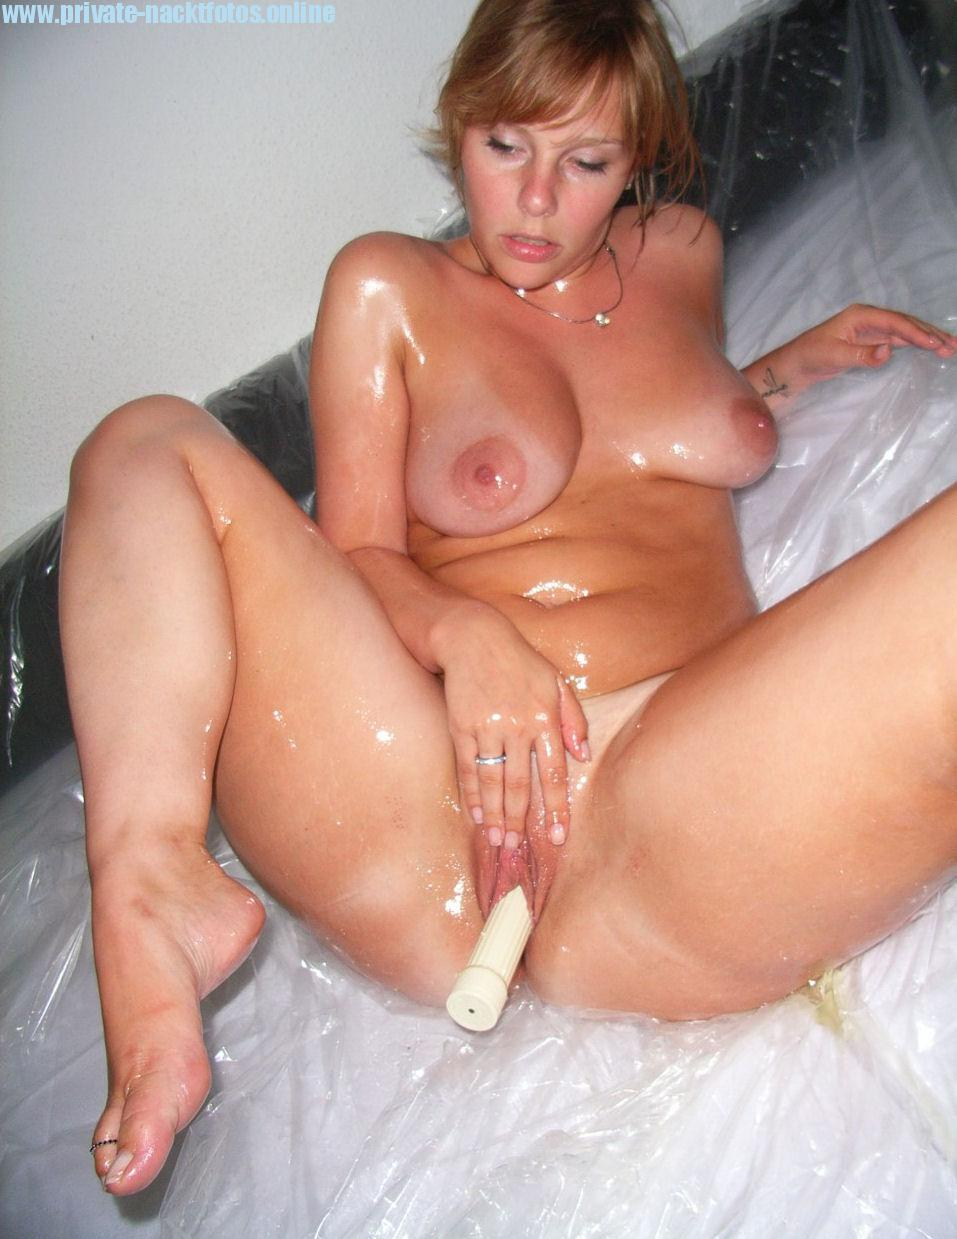 Privater blowjob von dicker hausfrau aus erotik community